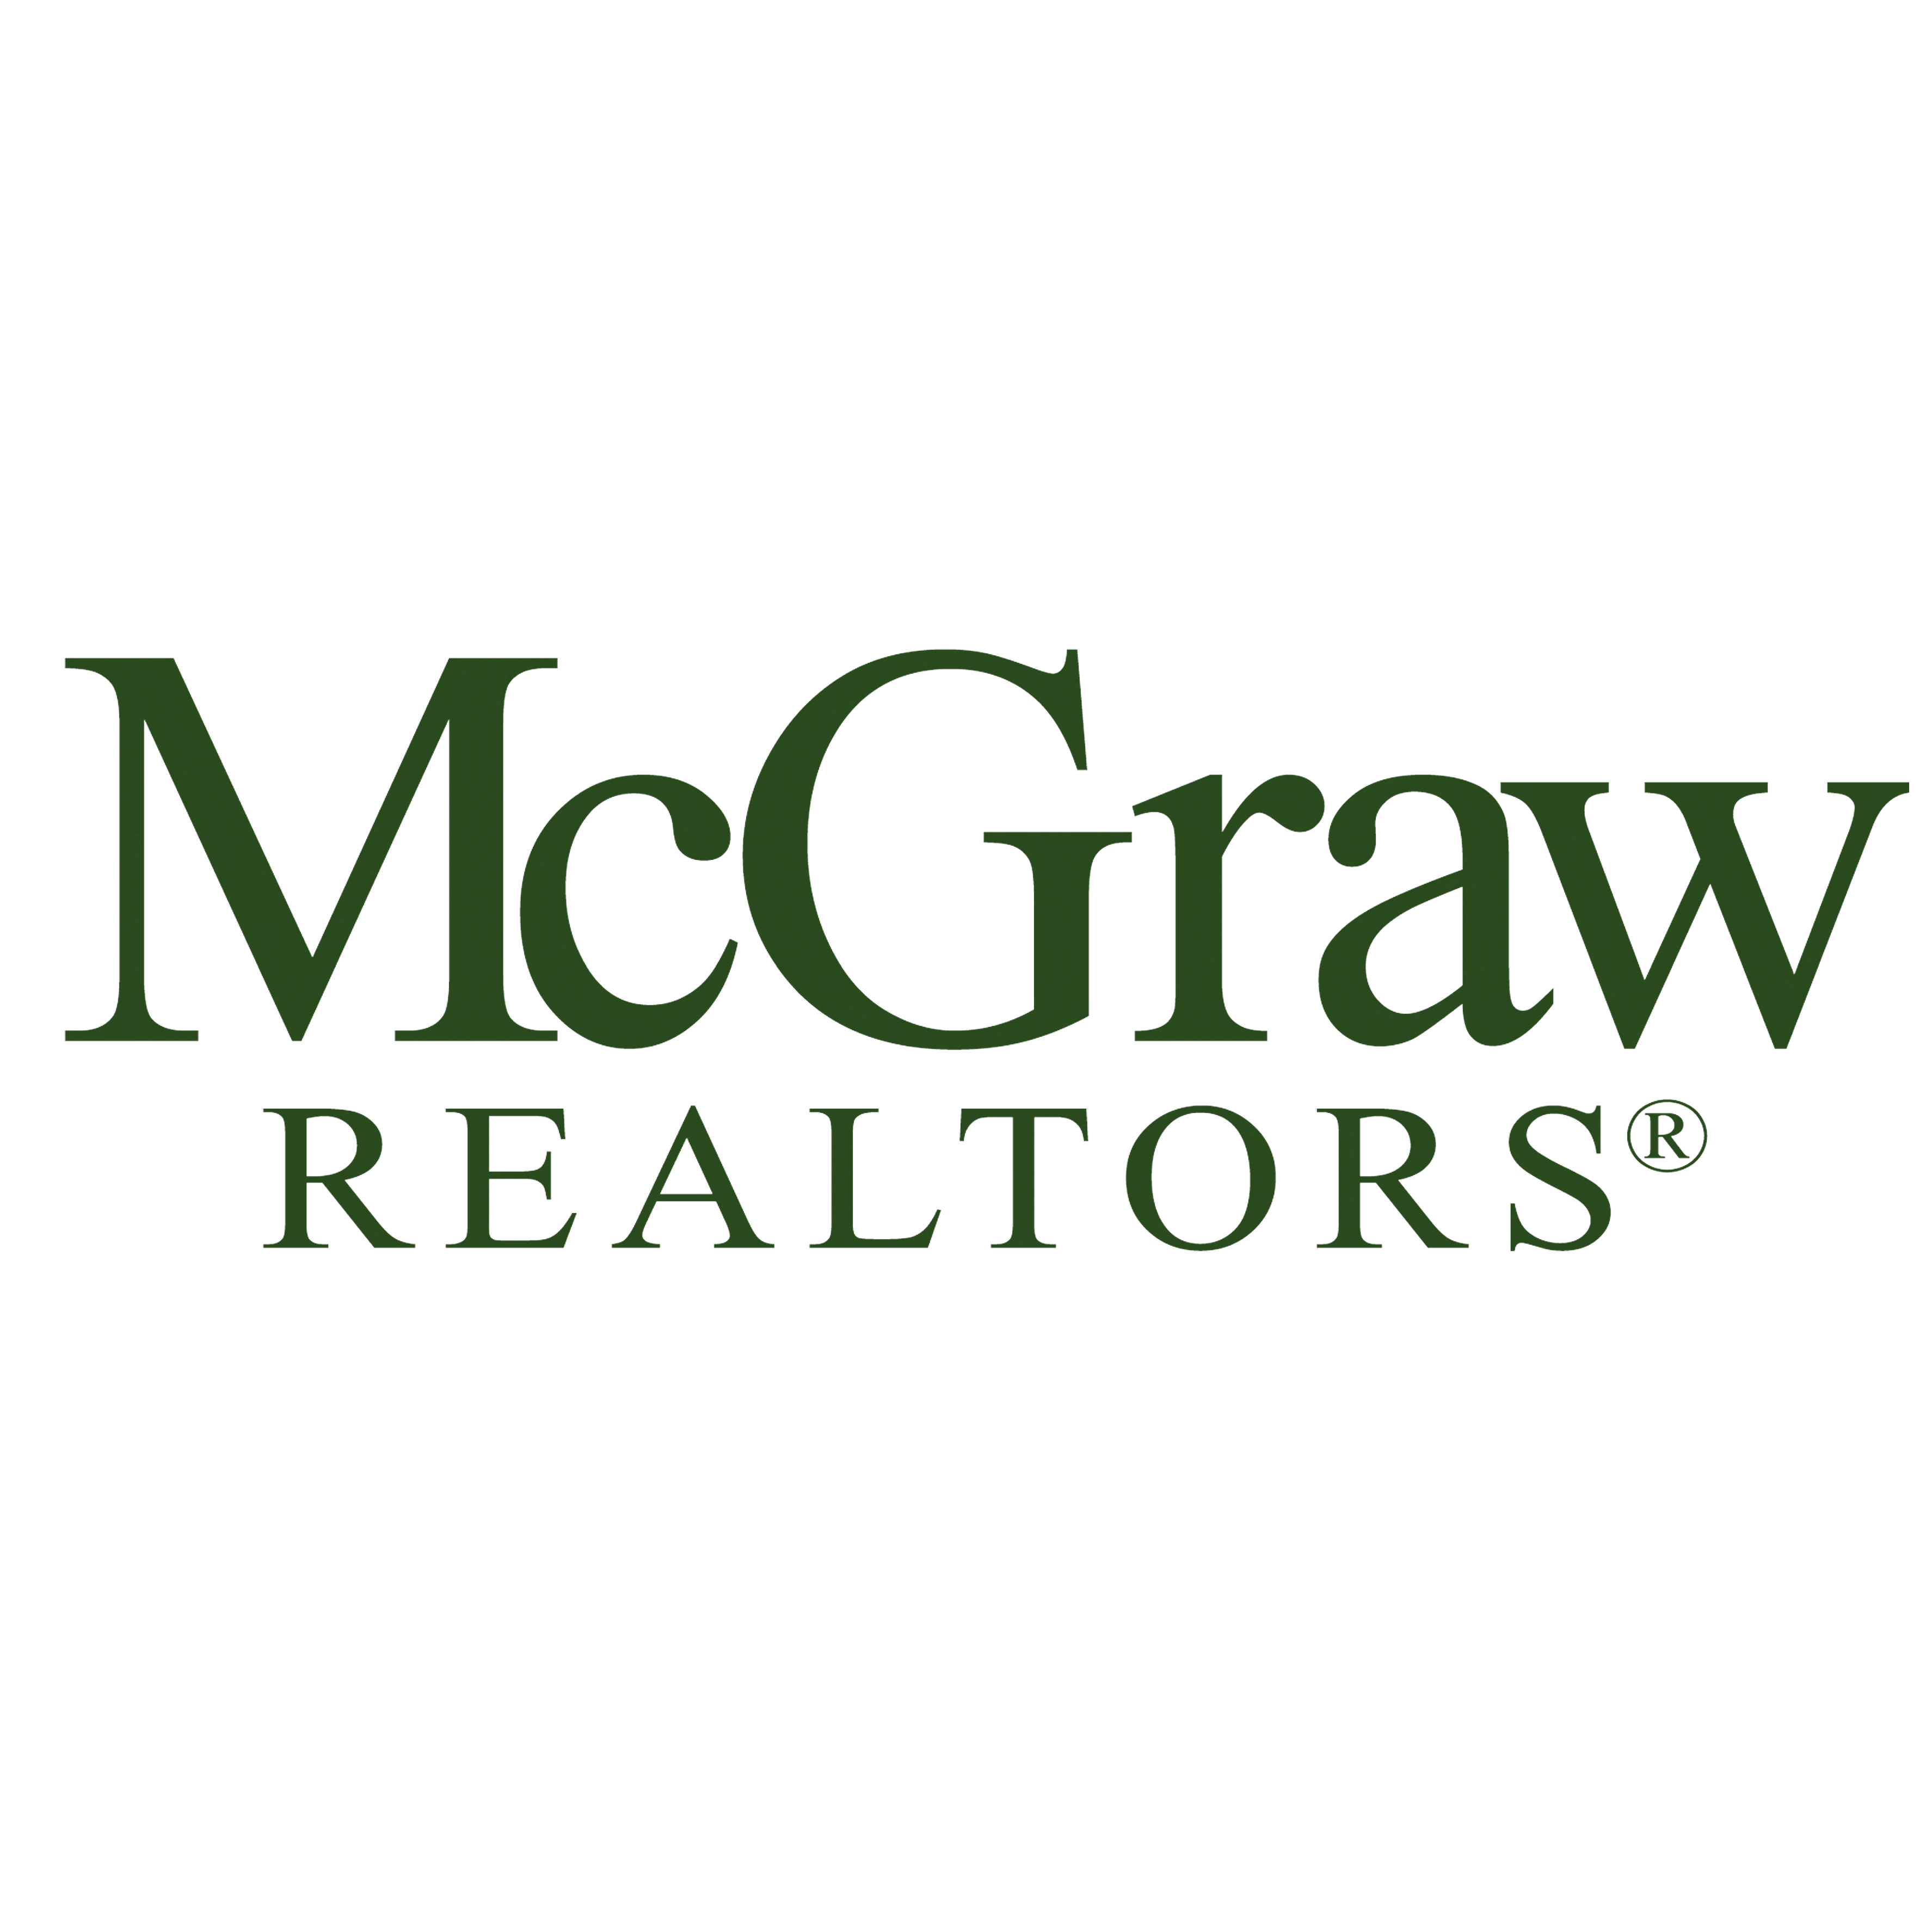 McGraw Realtors